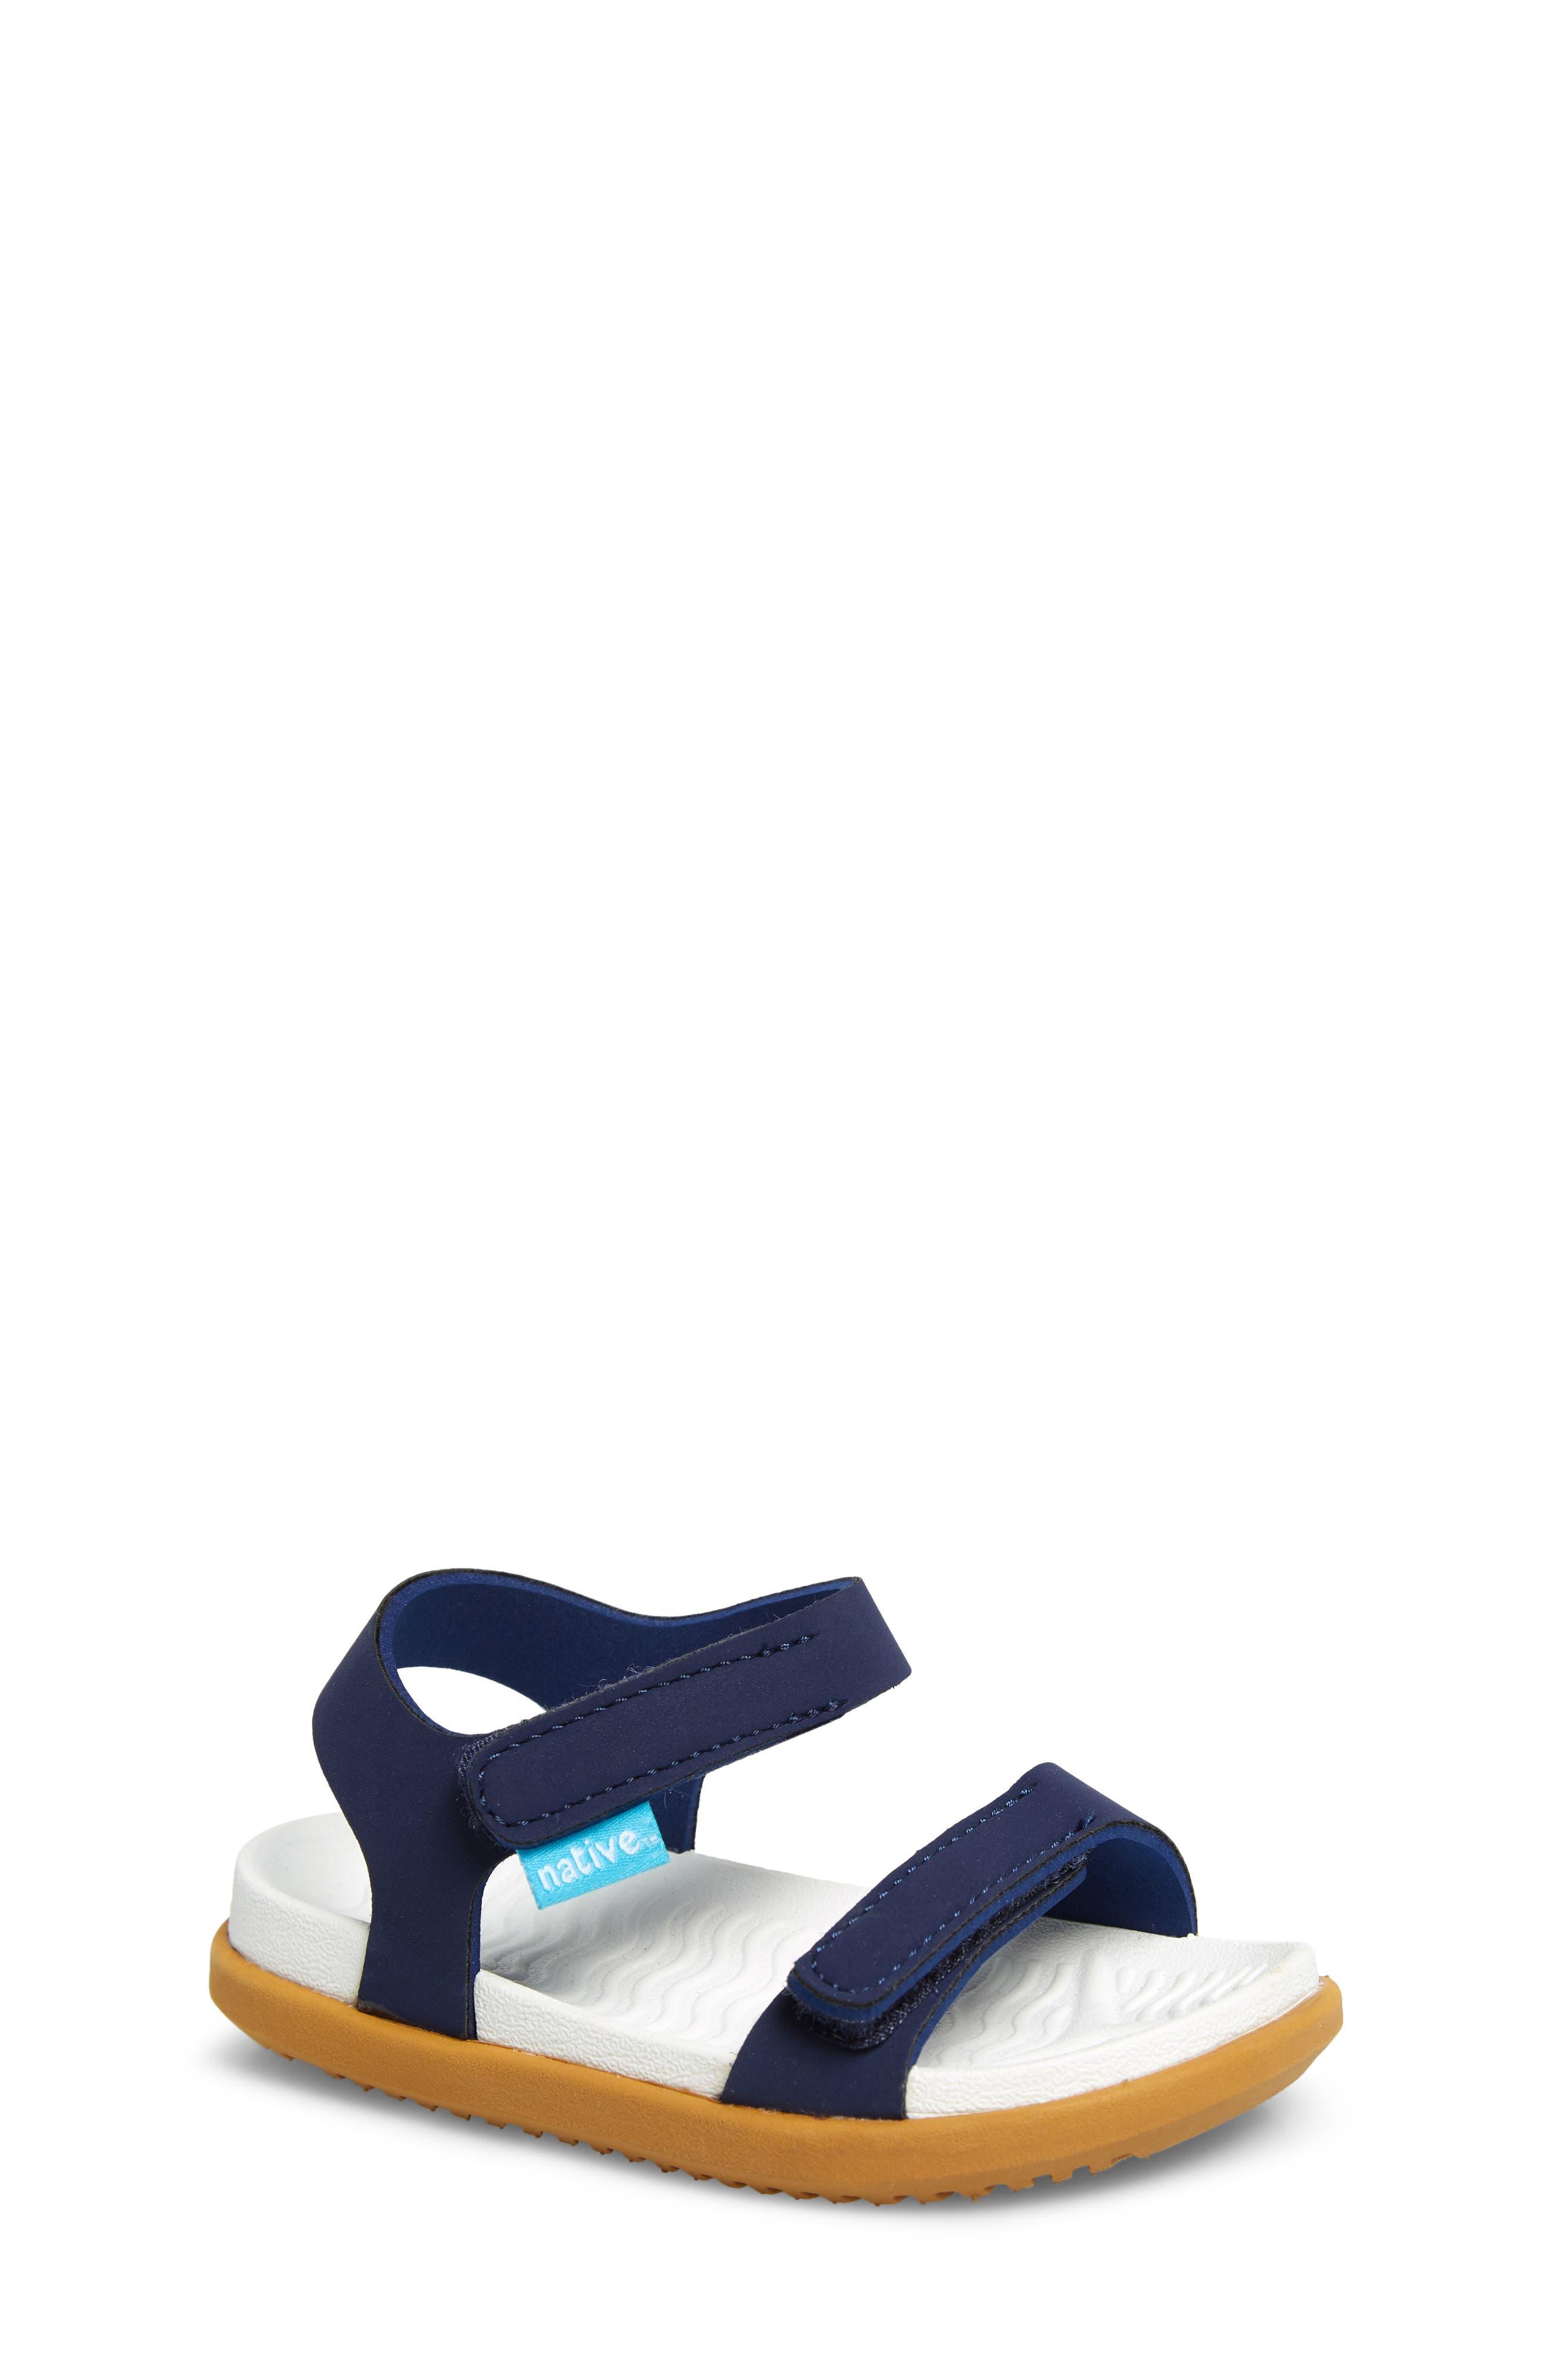 Charley Child Waterproof Flat Vegan Sandal, Main, color, REGATTA BLUE/ WHITE/ BROWN